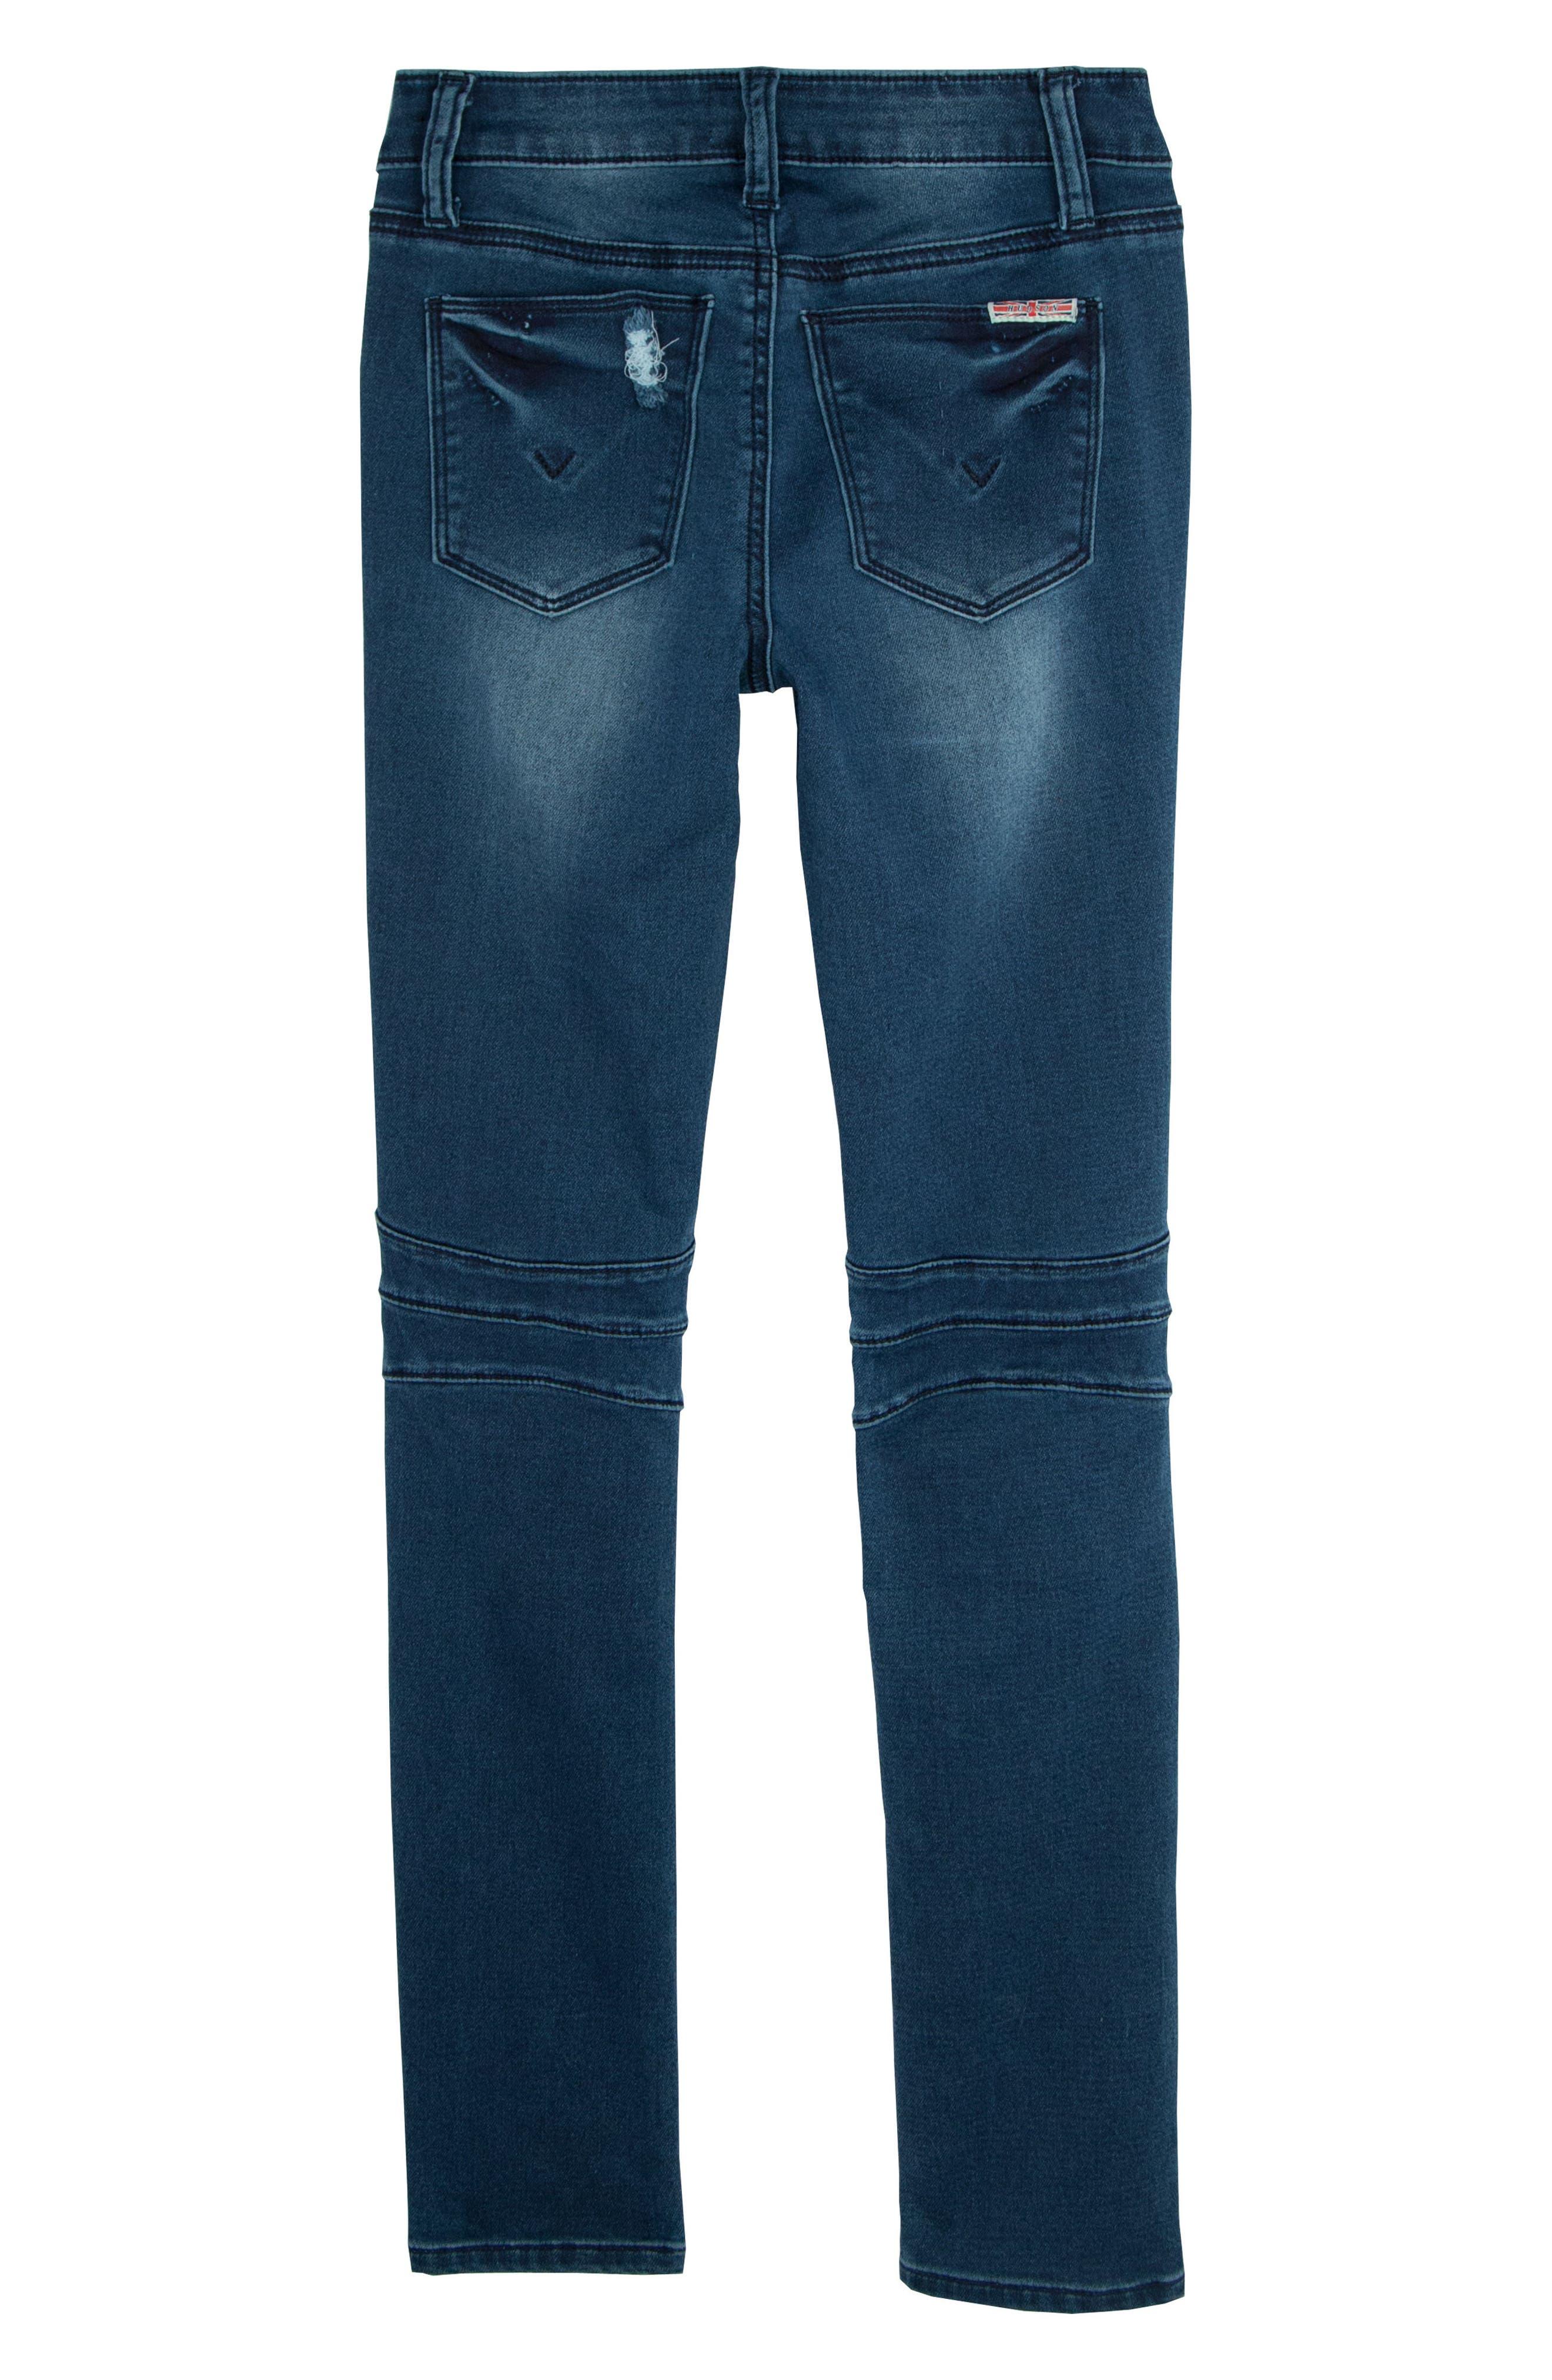 London Distressed Moto Skinny Jeans,                             Alternate thumbnail 2, color,                             403